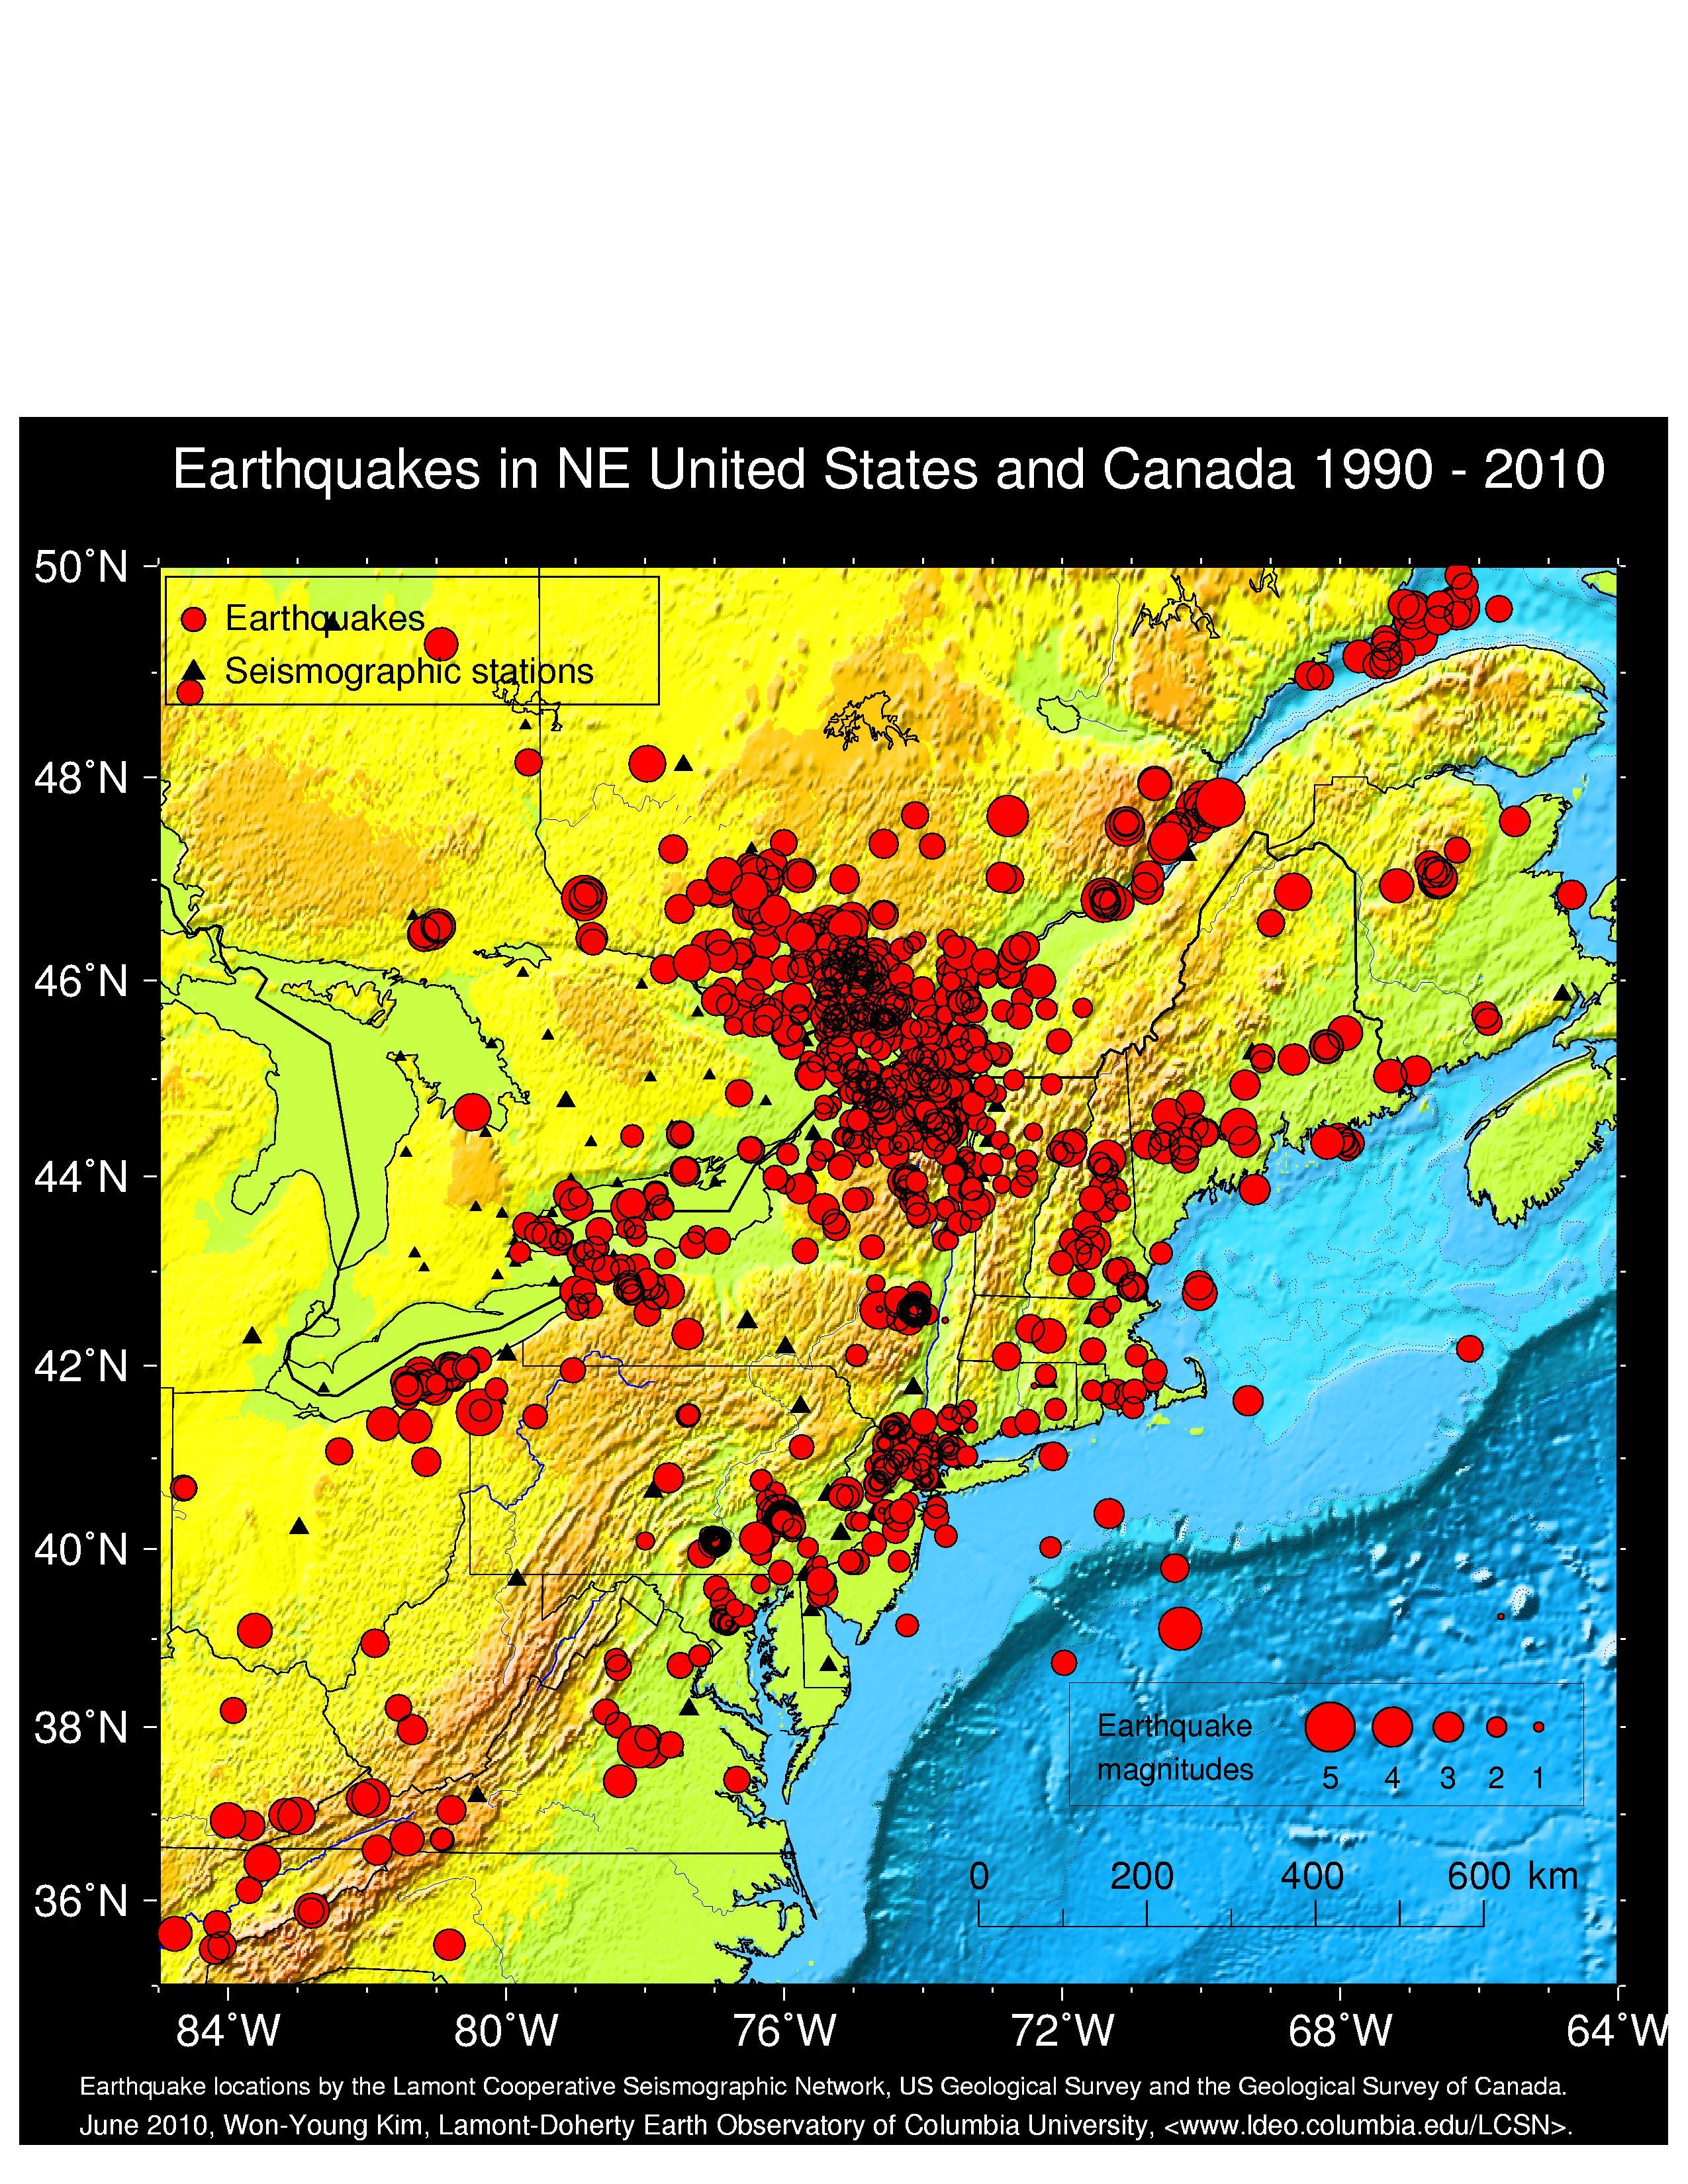 LamontDoherty Cooperative Seismographic Network